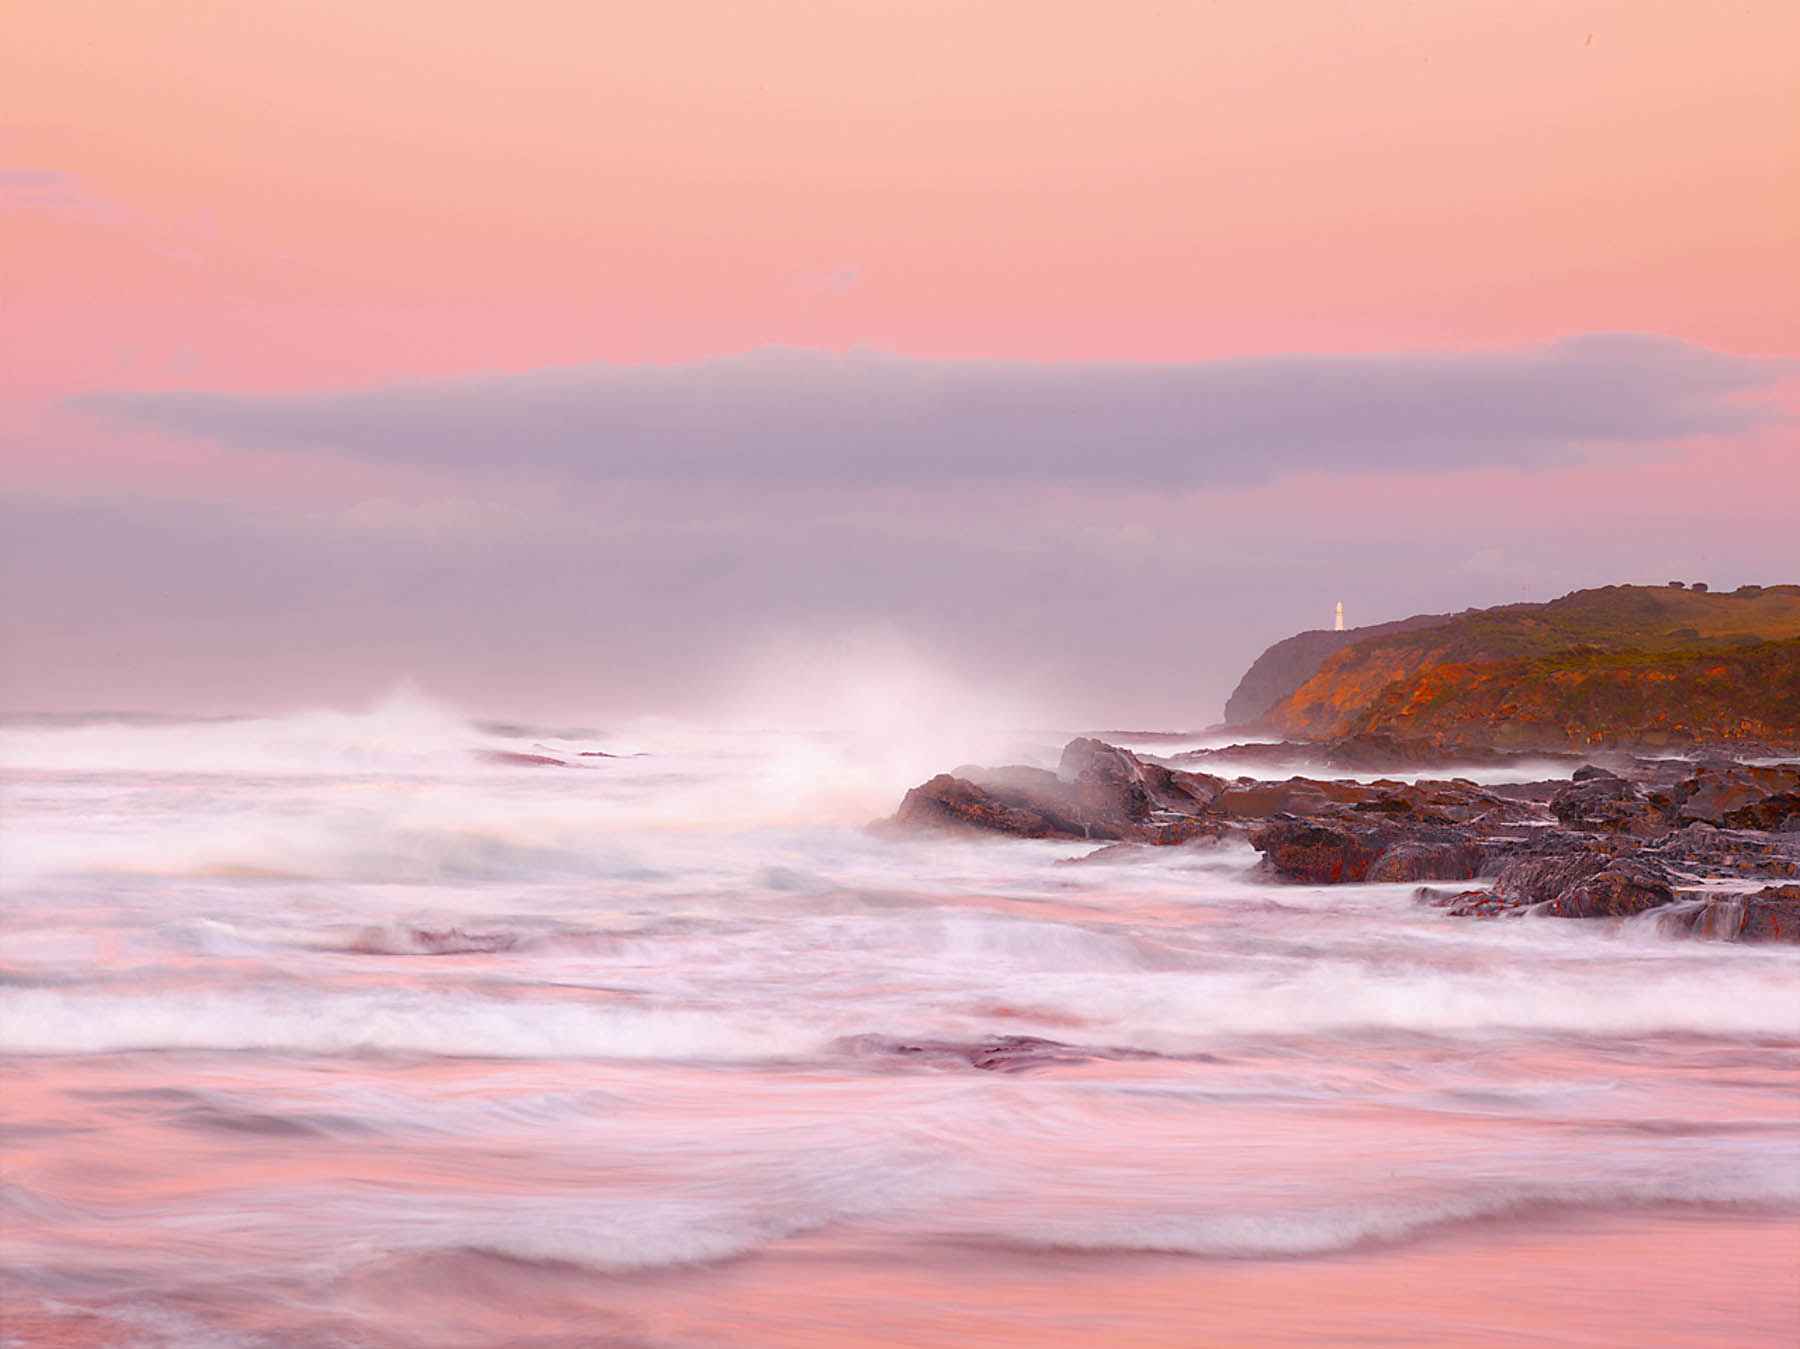 A pastel sunrise over Cape Otway, Victoria, Australia.